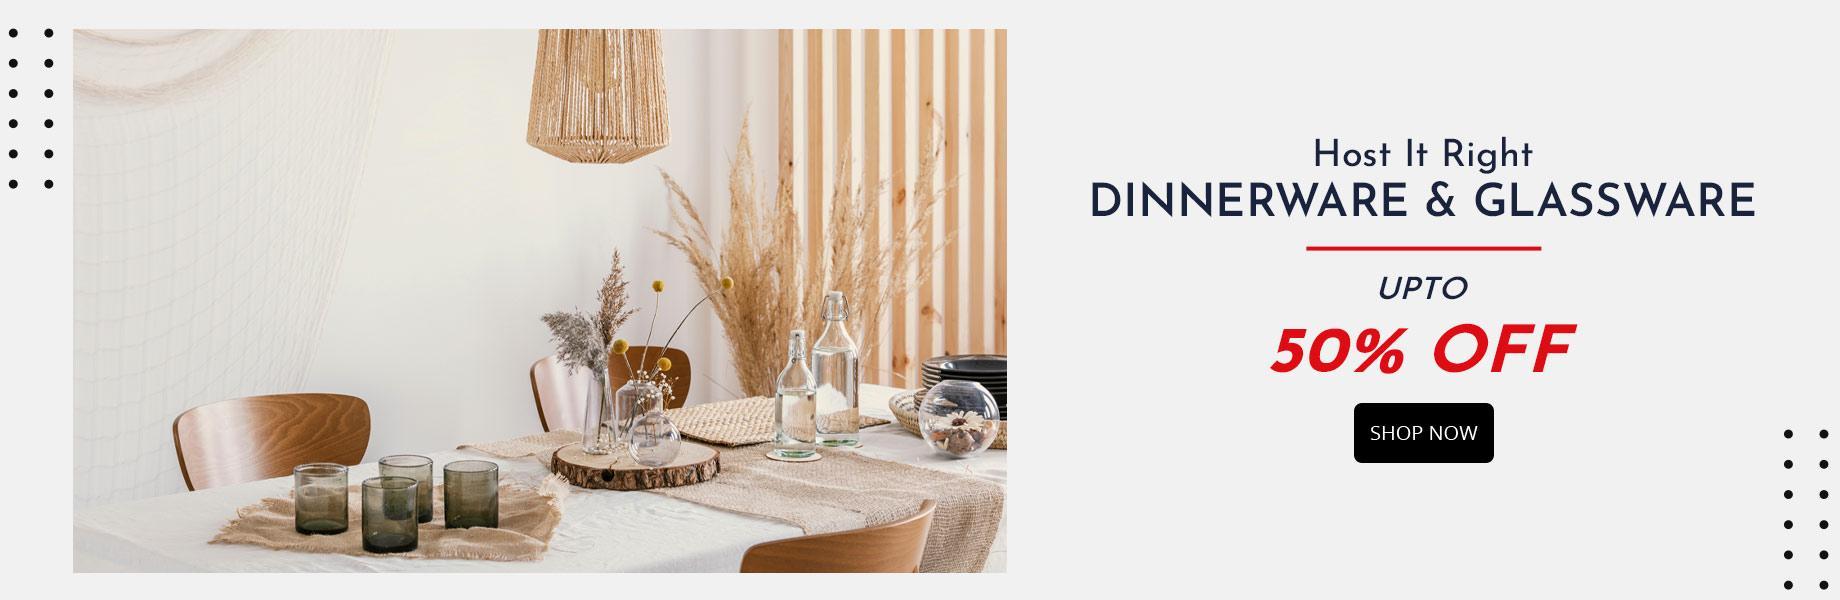 Homestop-Carousals-Dining-&-Glassware-Web.jpg